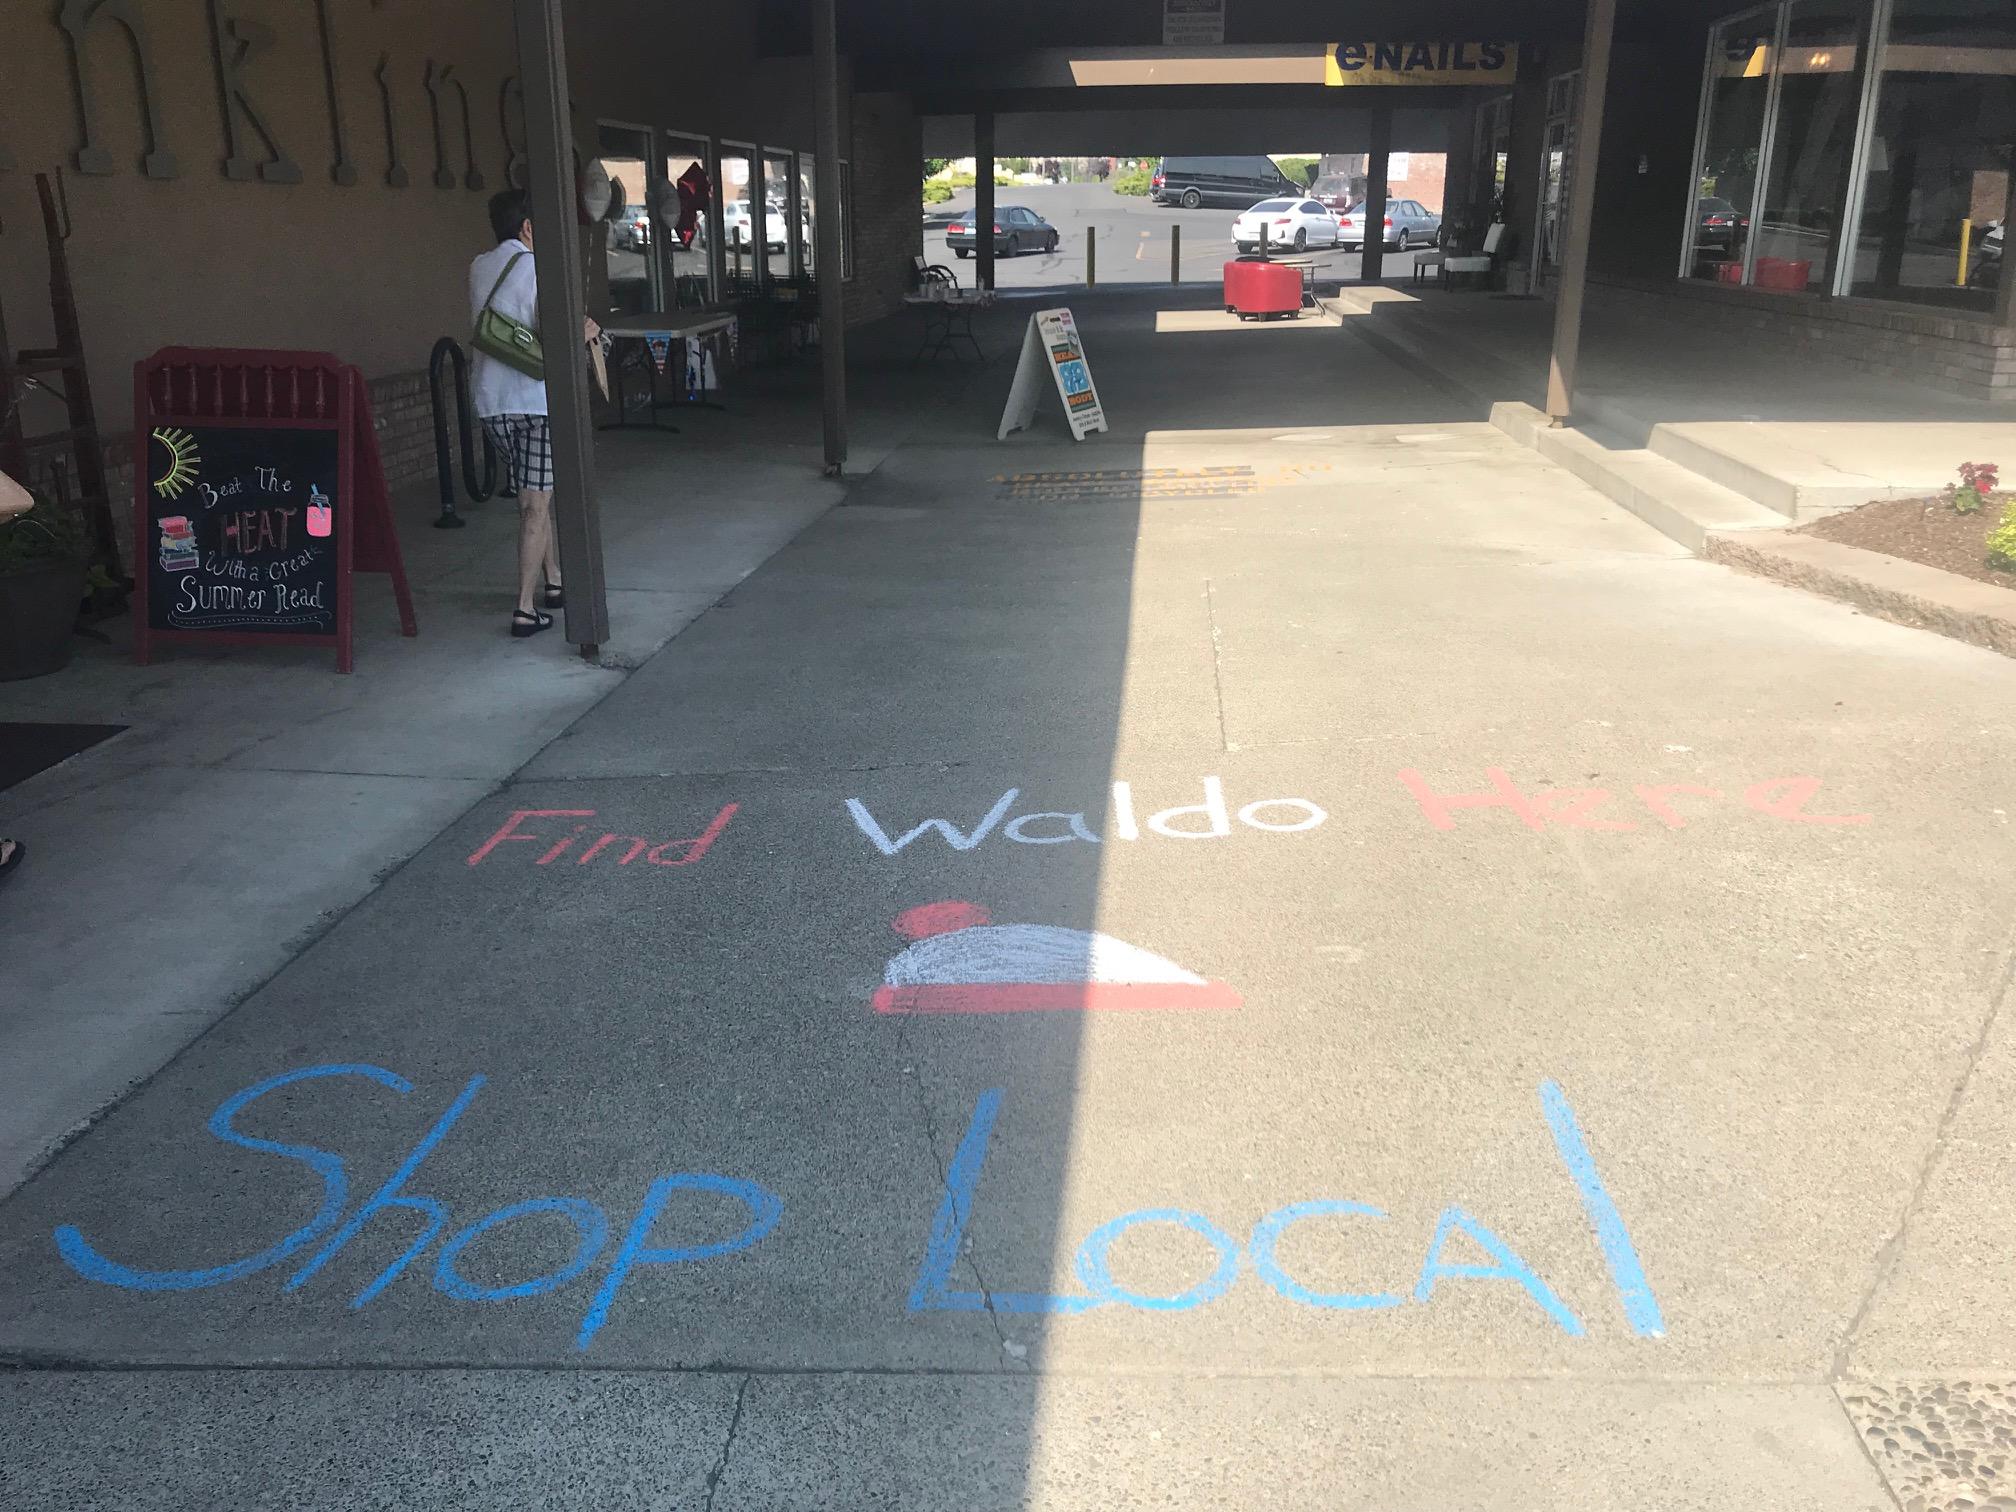 Inklings Bookshop in Yakima, Washington, promoted Find Waldo Local with chalk art.